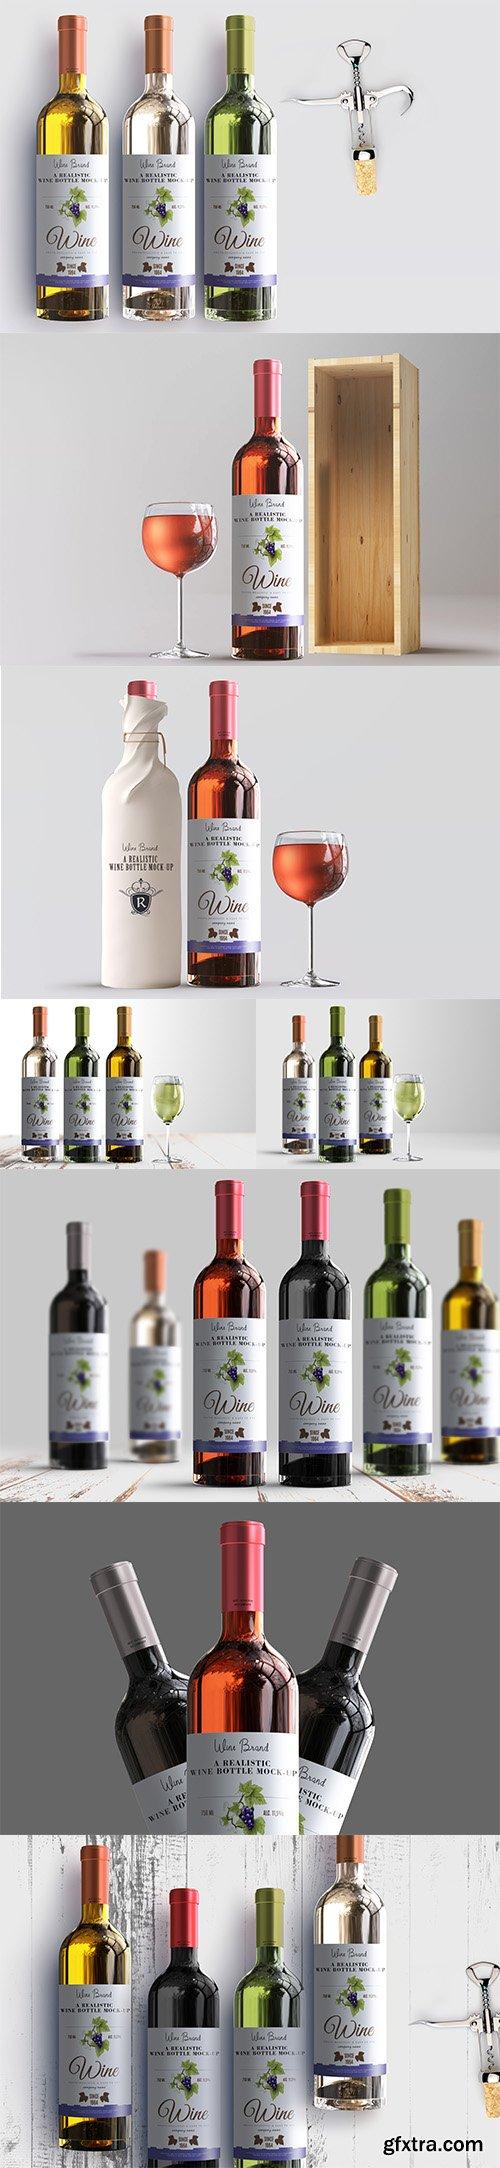 Realistic Wine Bottle Label Mockup Pack